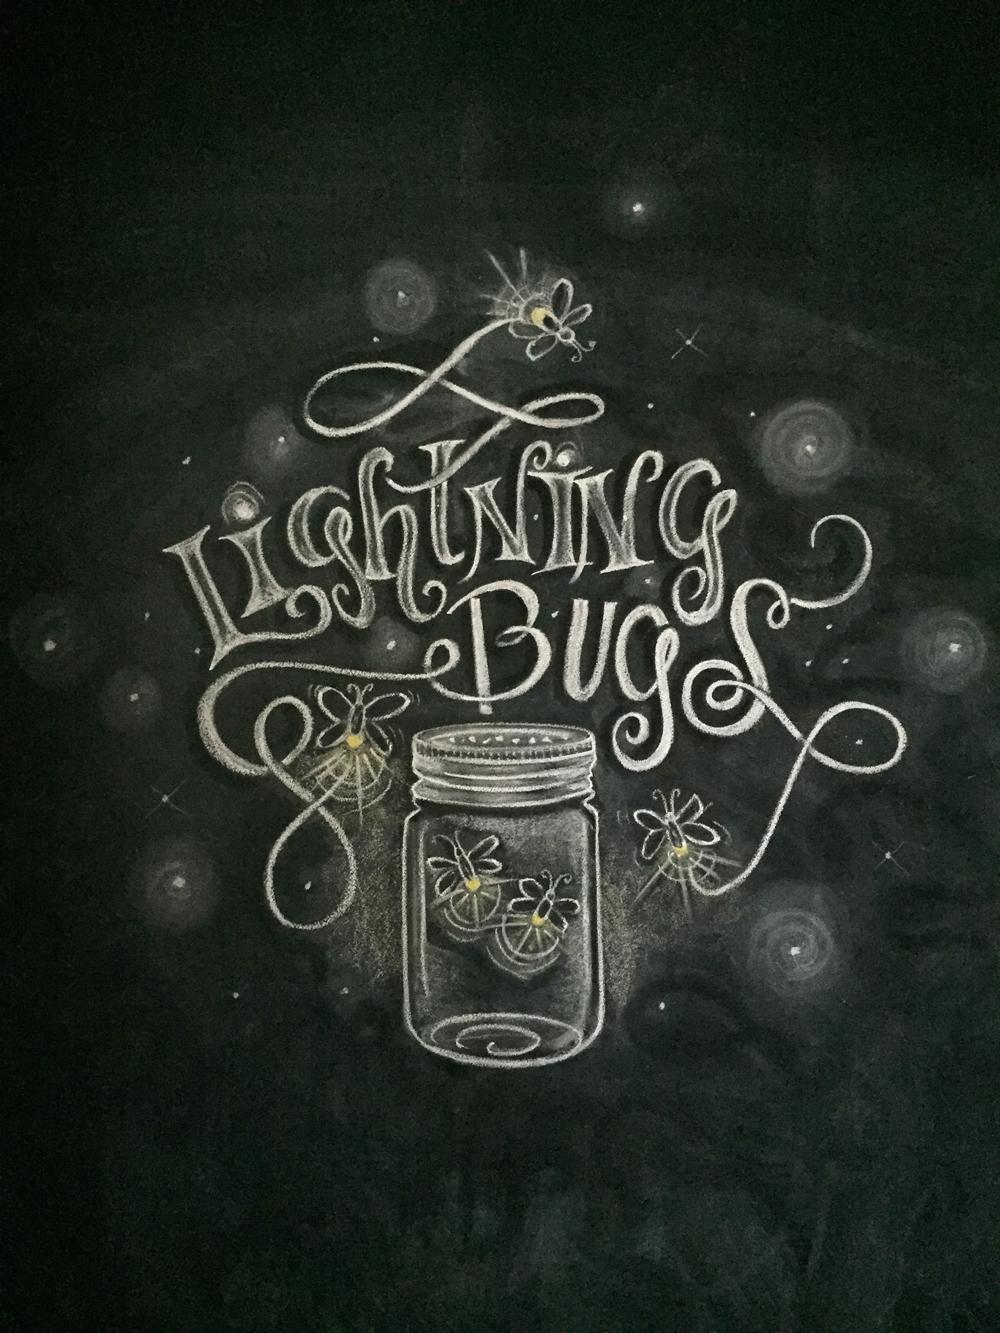 LightningBugs.jpg